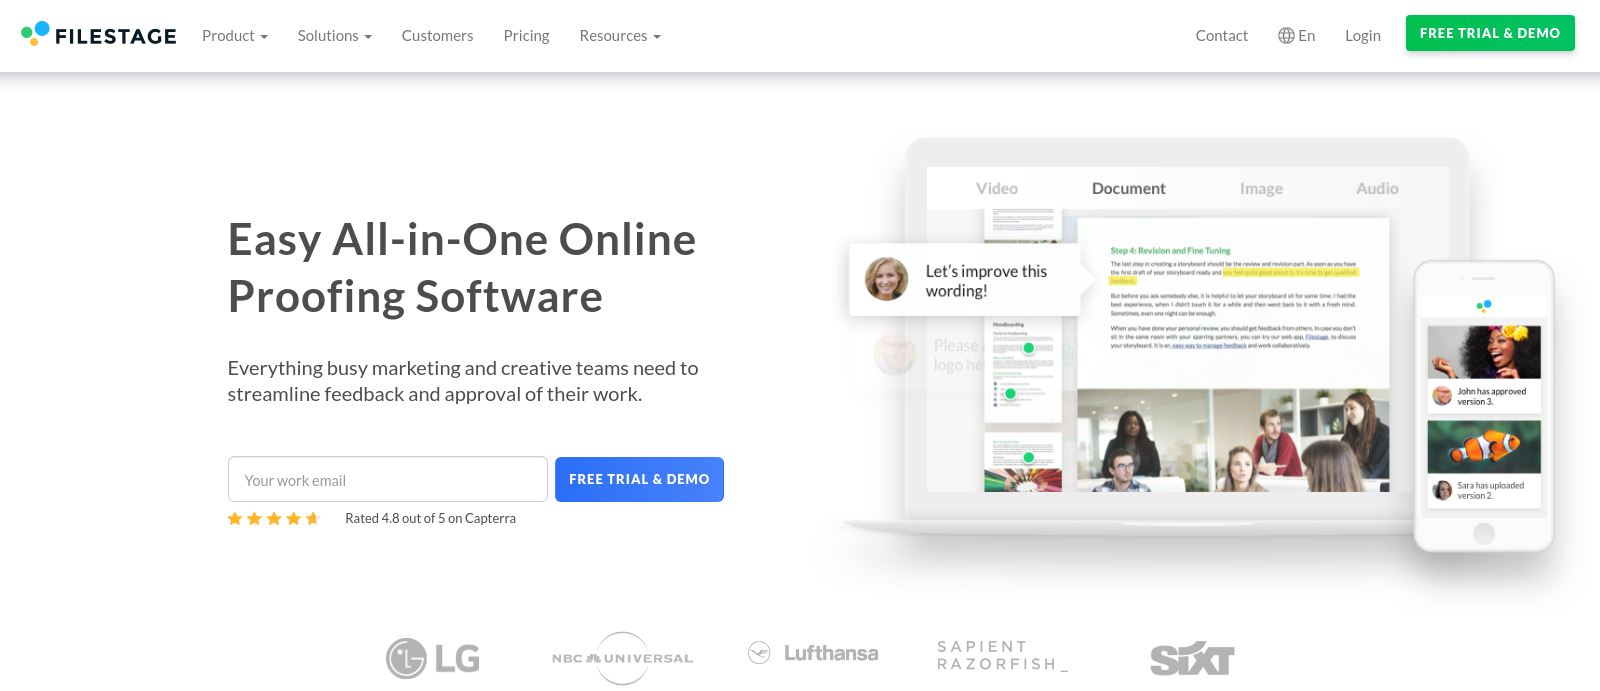 Filestage-online-proofing-software-filestage-fyle